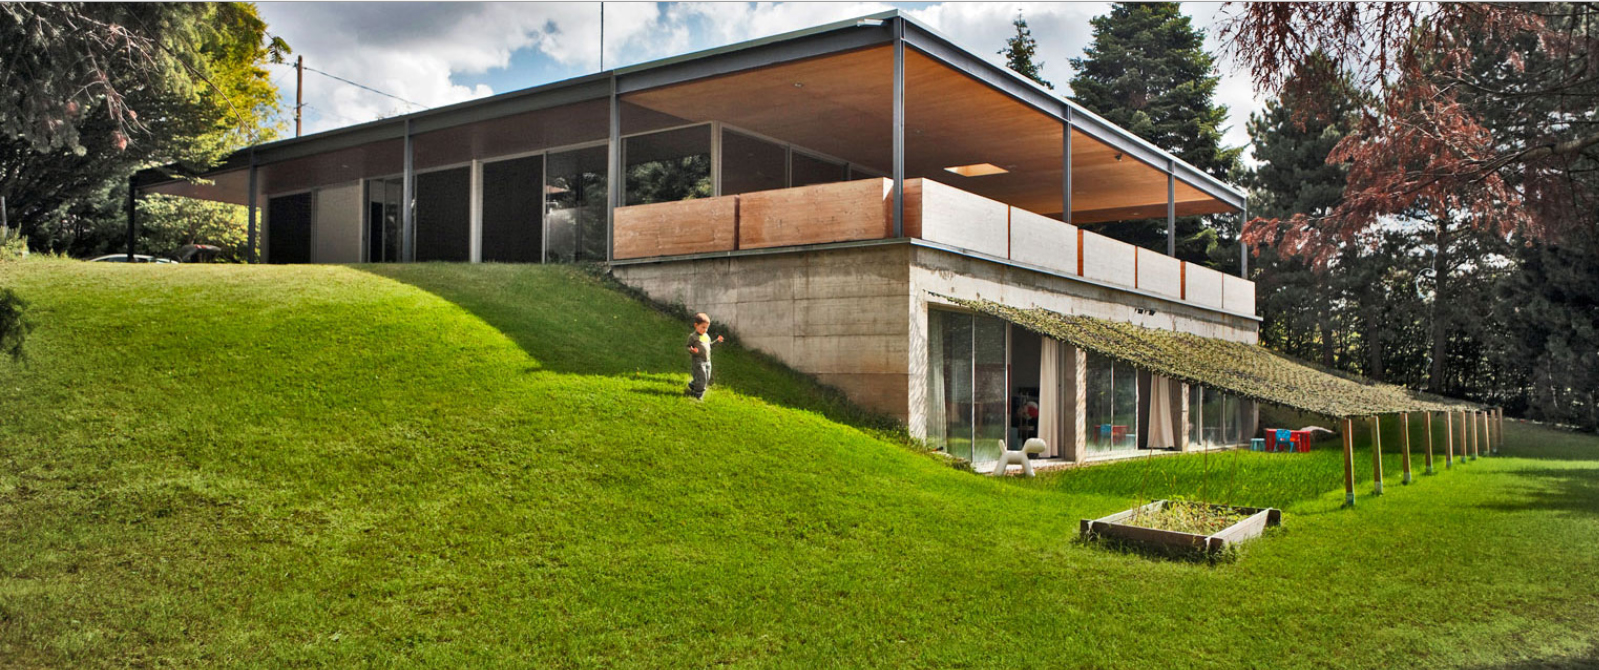 Extension beton